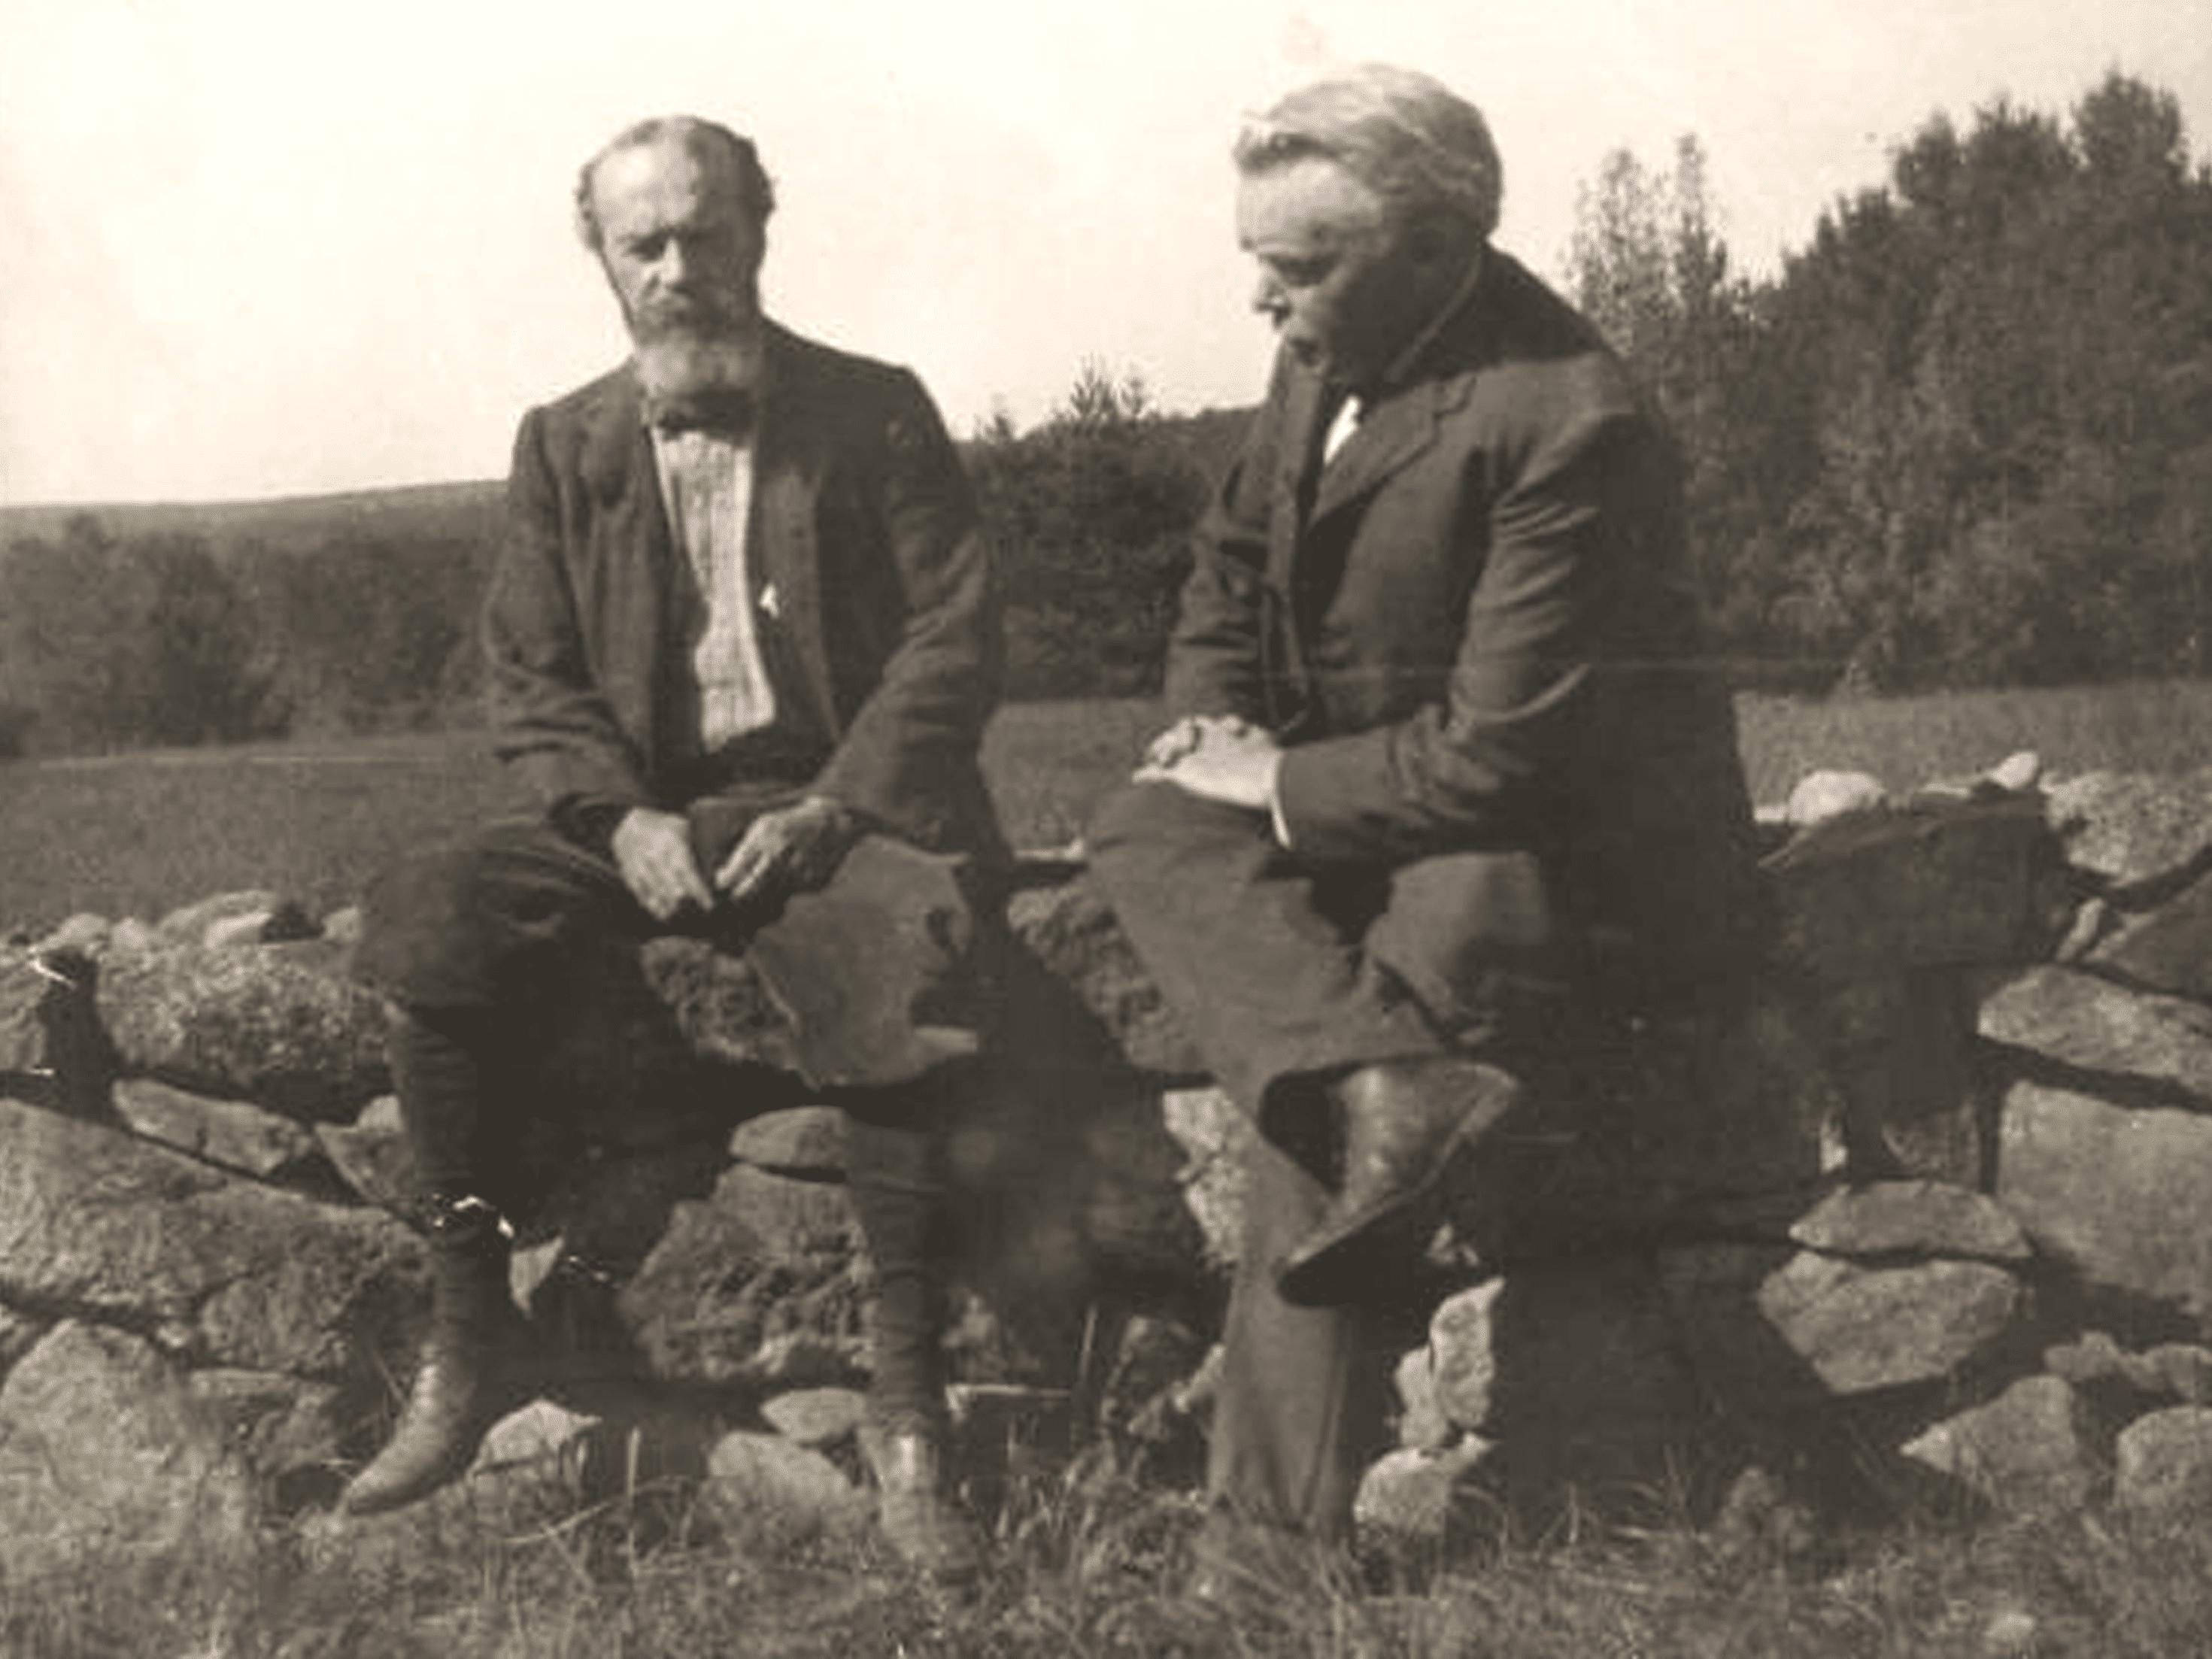 William James Psychologist Biography